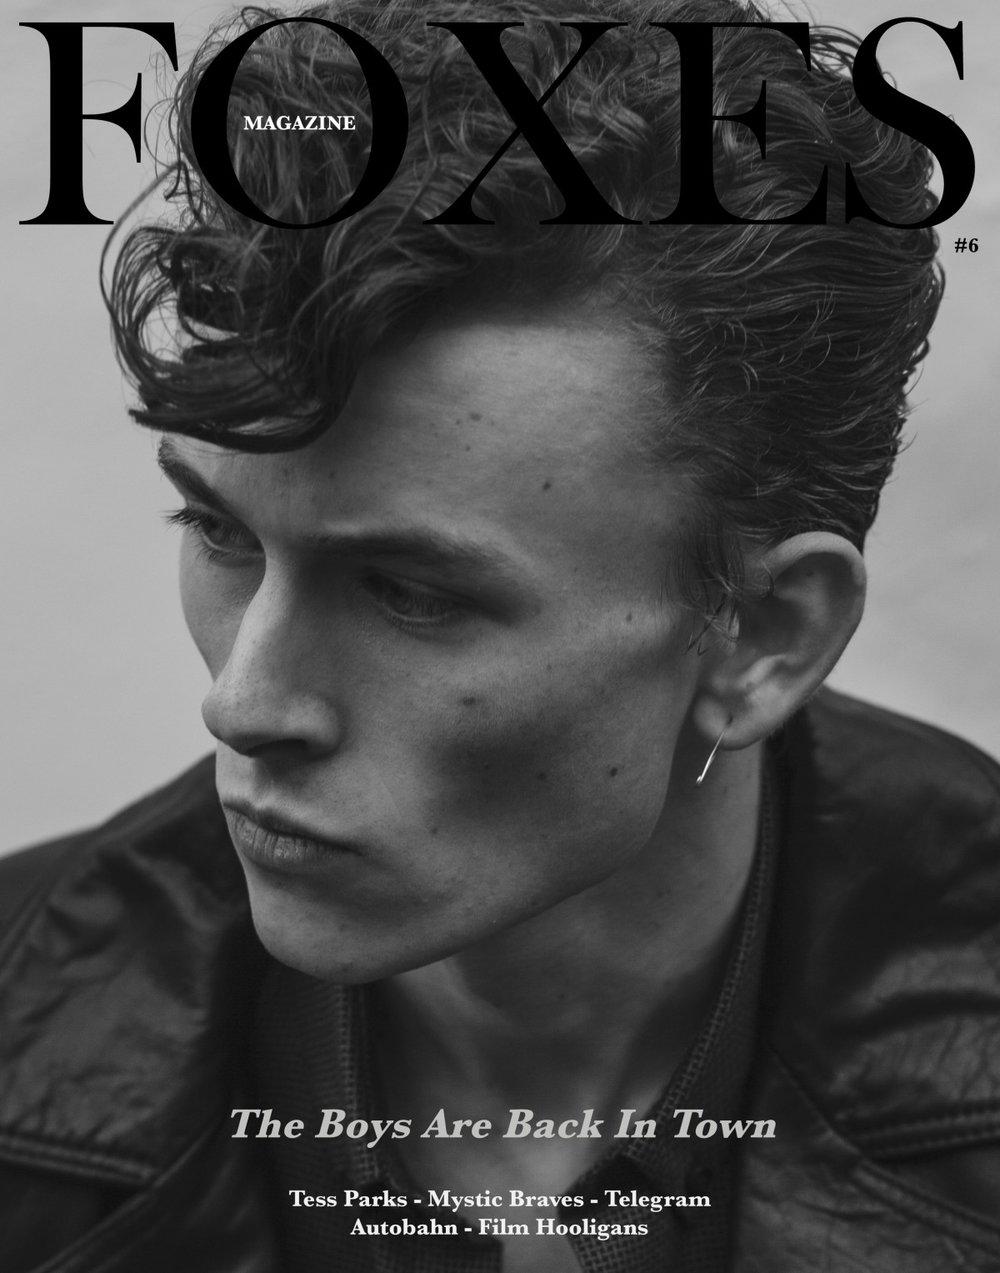 FOXESMagazine6COVER(1)_ED.jpg